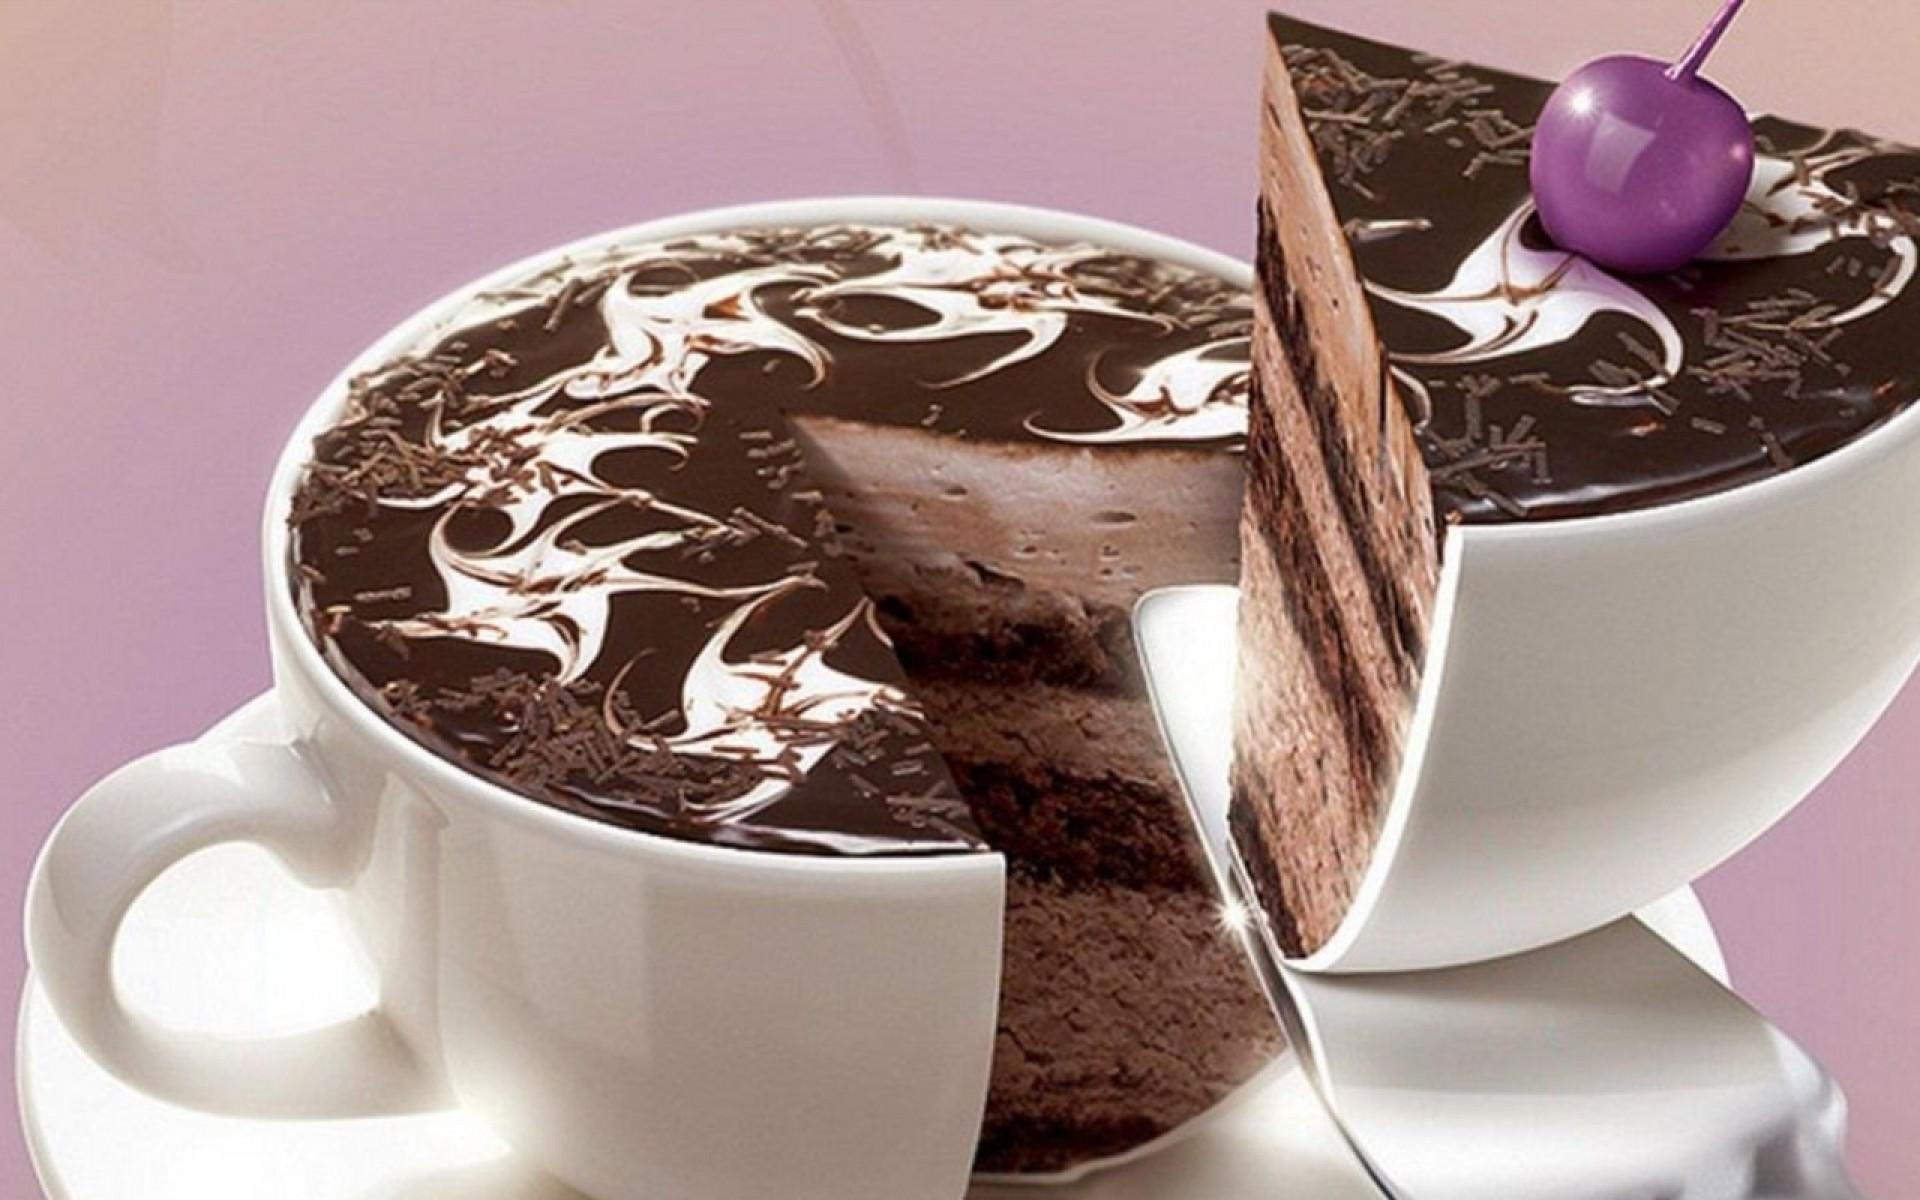 chocolate birthday cake desktop wallpaper download this wallpaper for 1920x1200